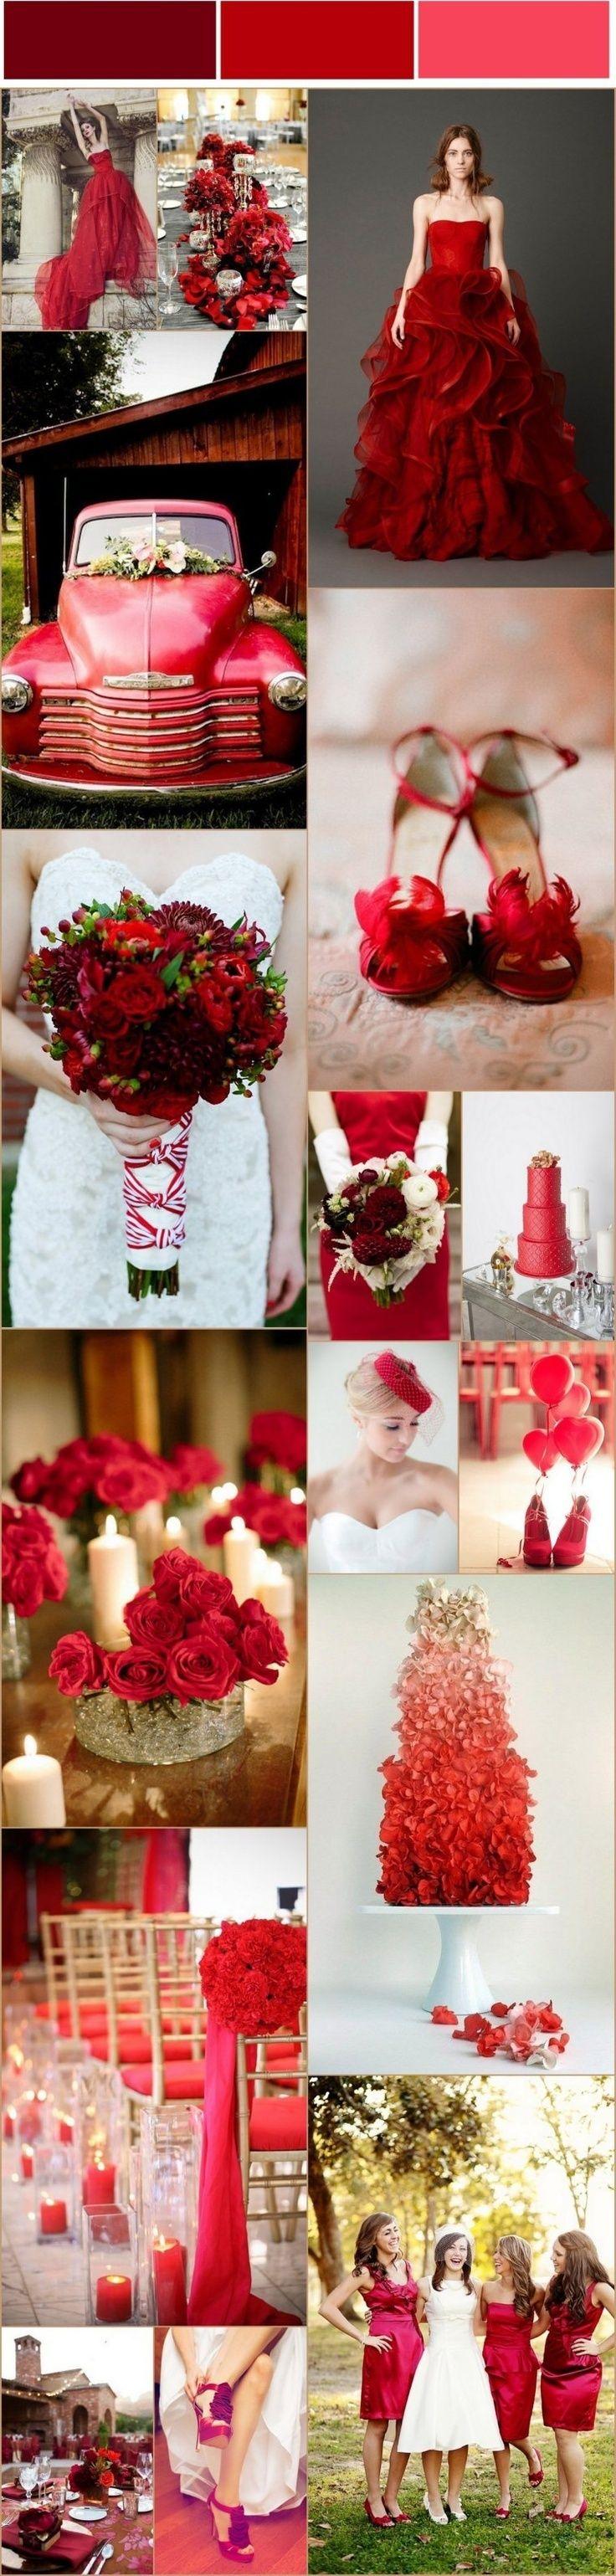 Red wedding ideas weddings pinterest red wedding weddingideas red wedding ideas junglespirit Gallery